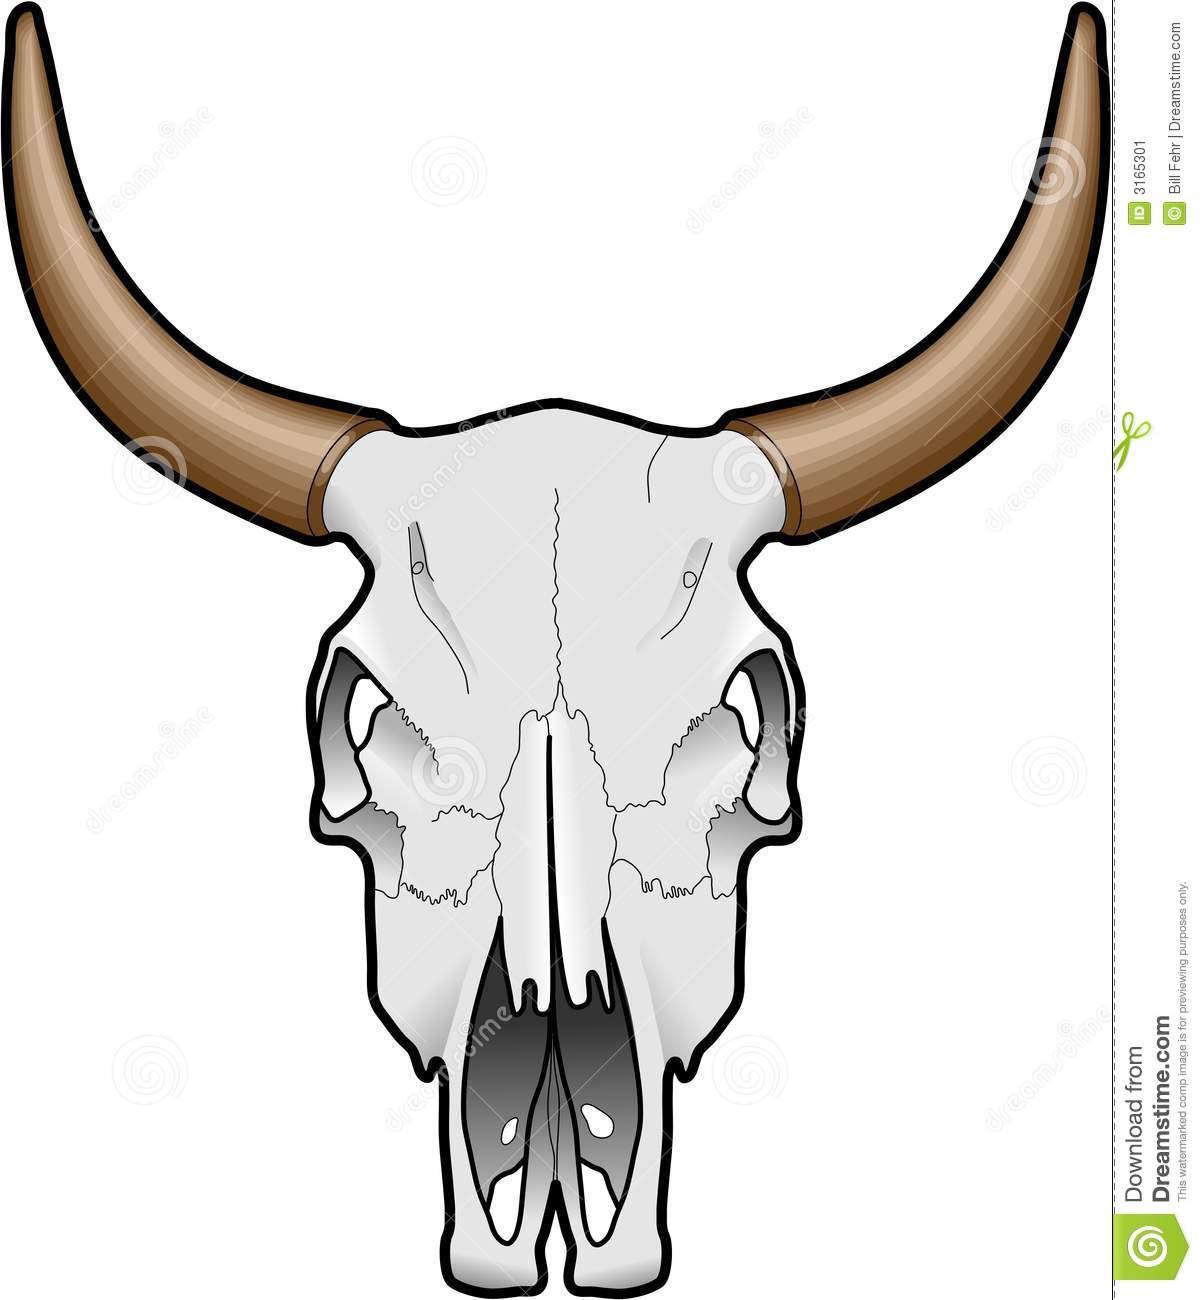 hight resolution of animal skull stock image image 3165301